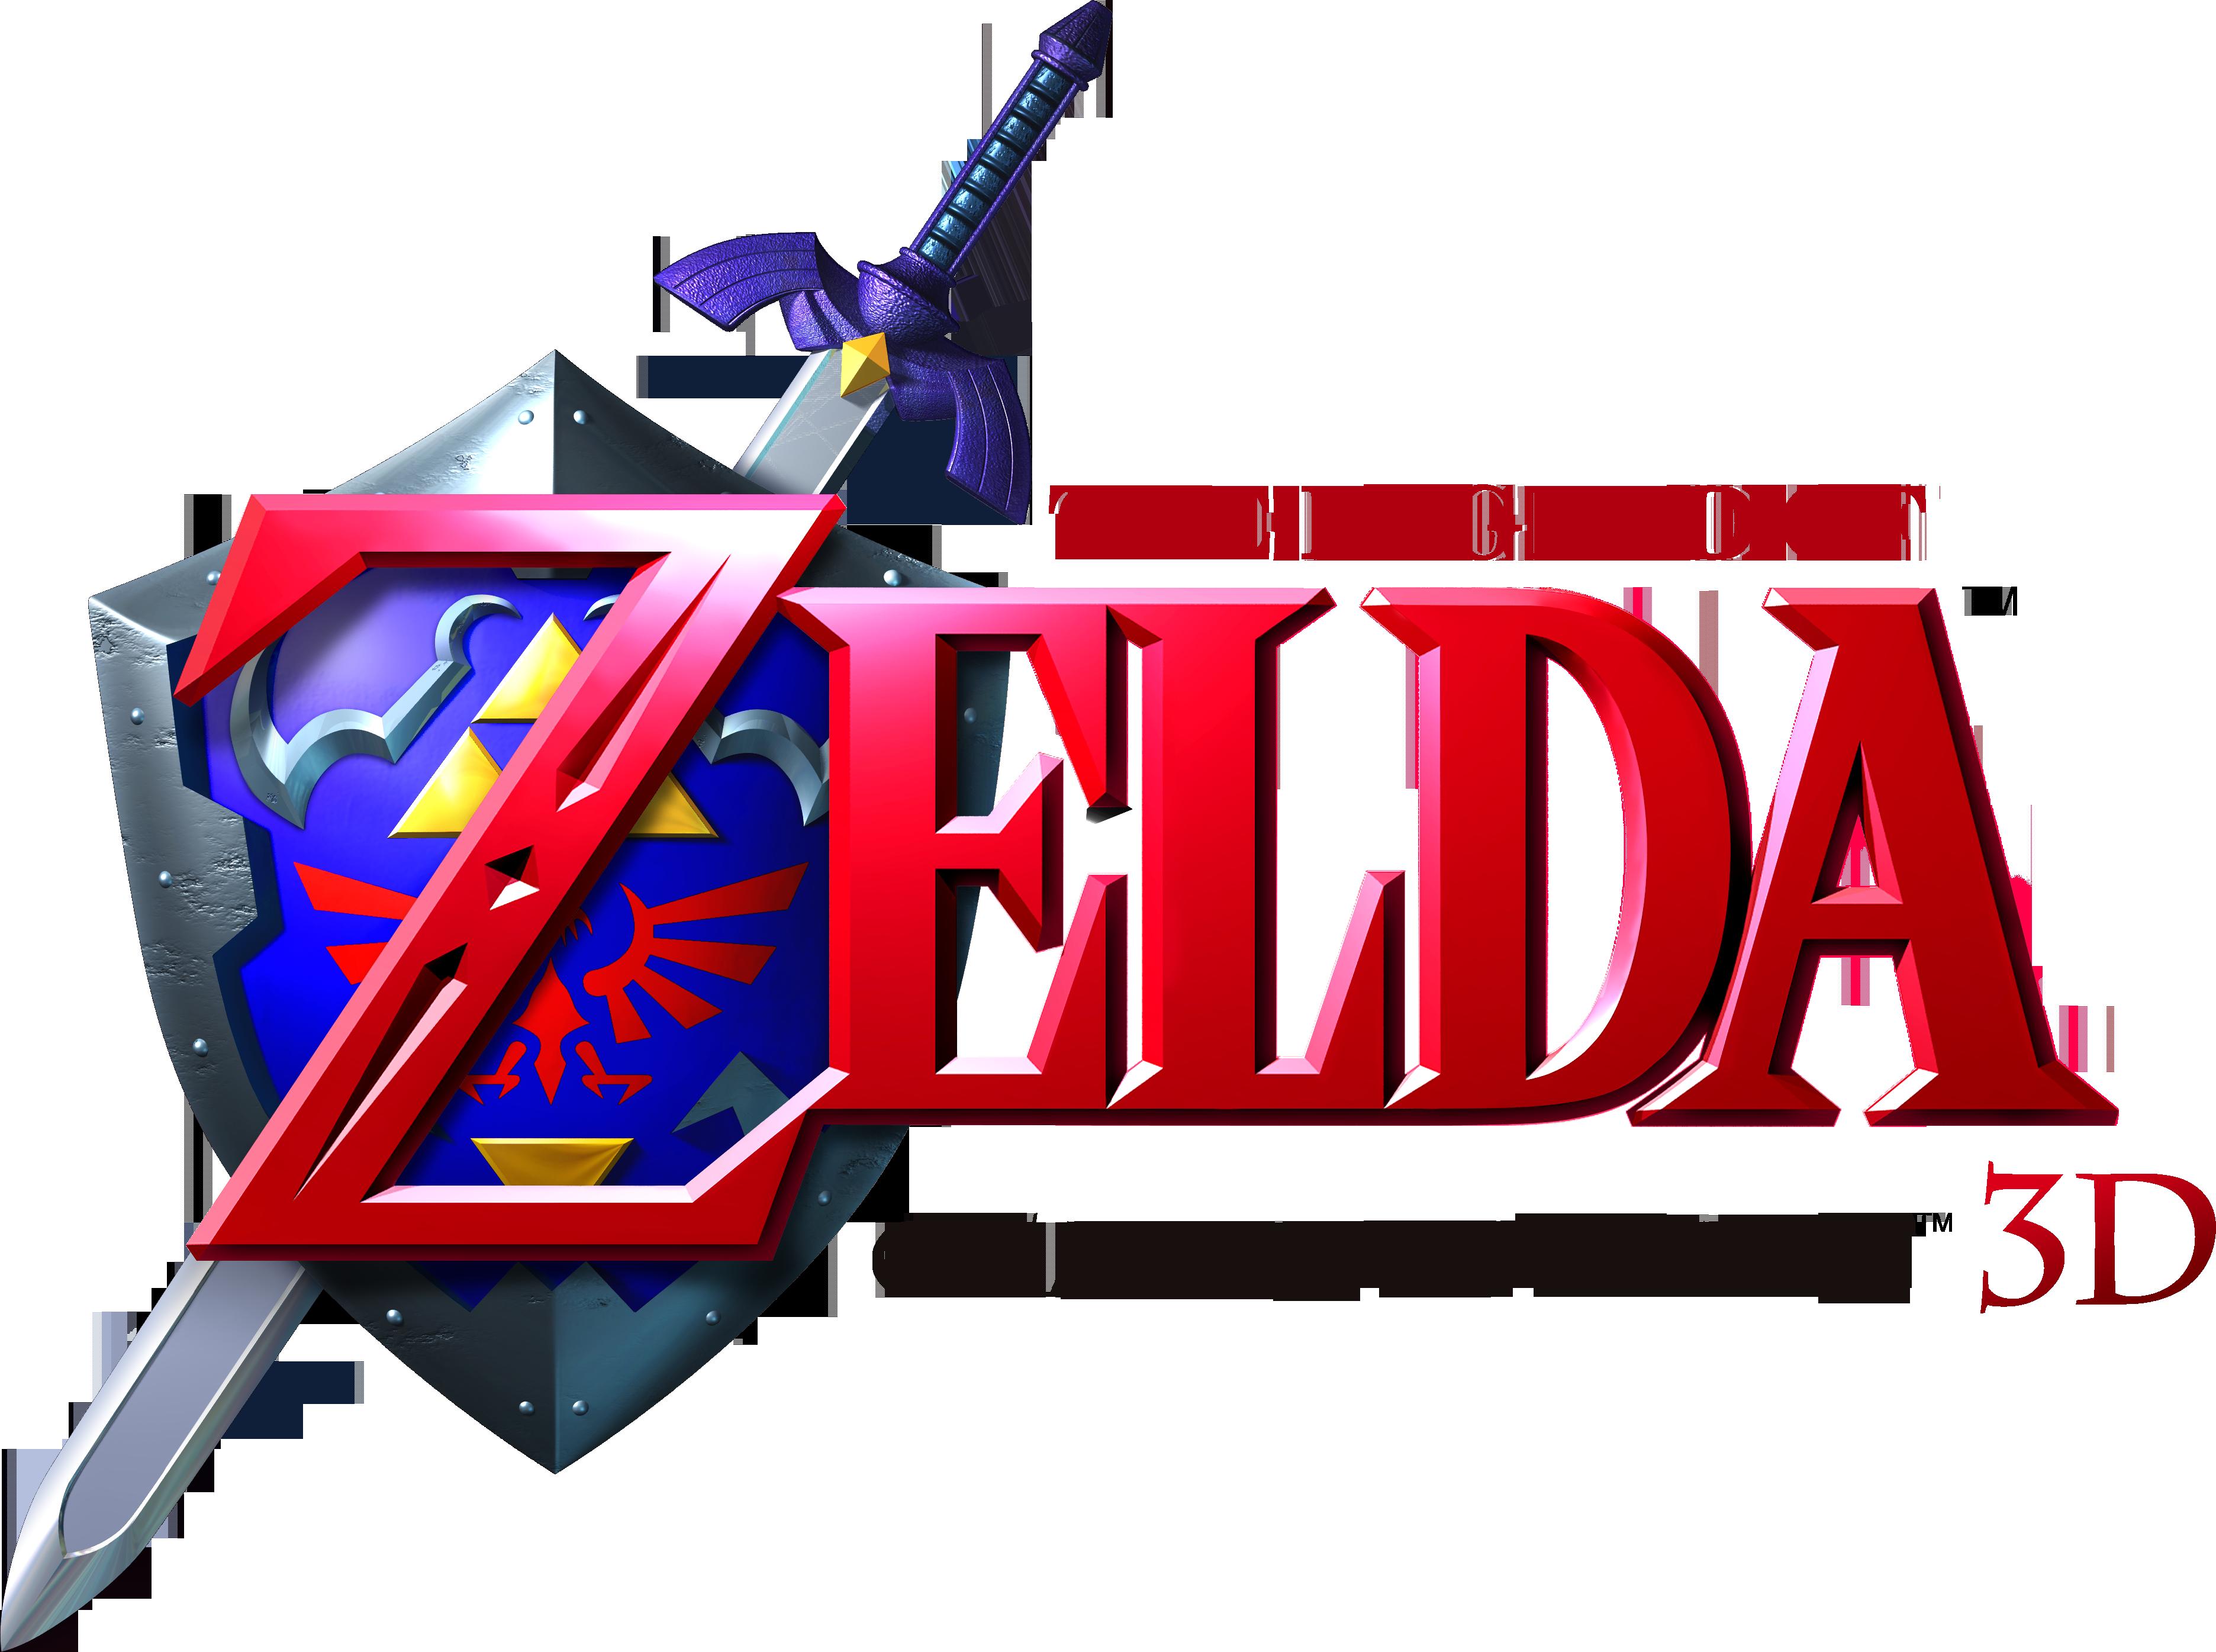 zelda and the phantom hourglass rom download